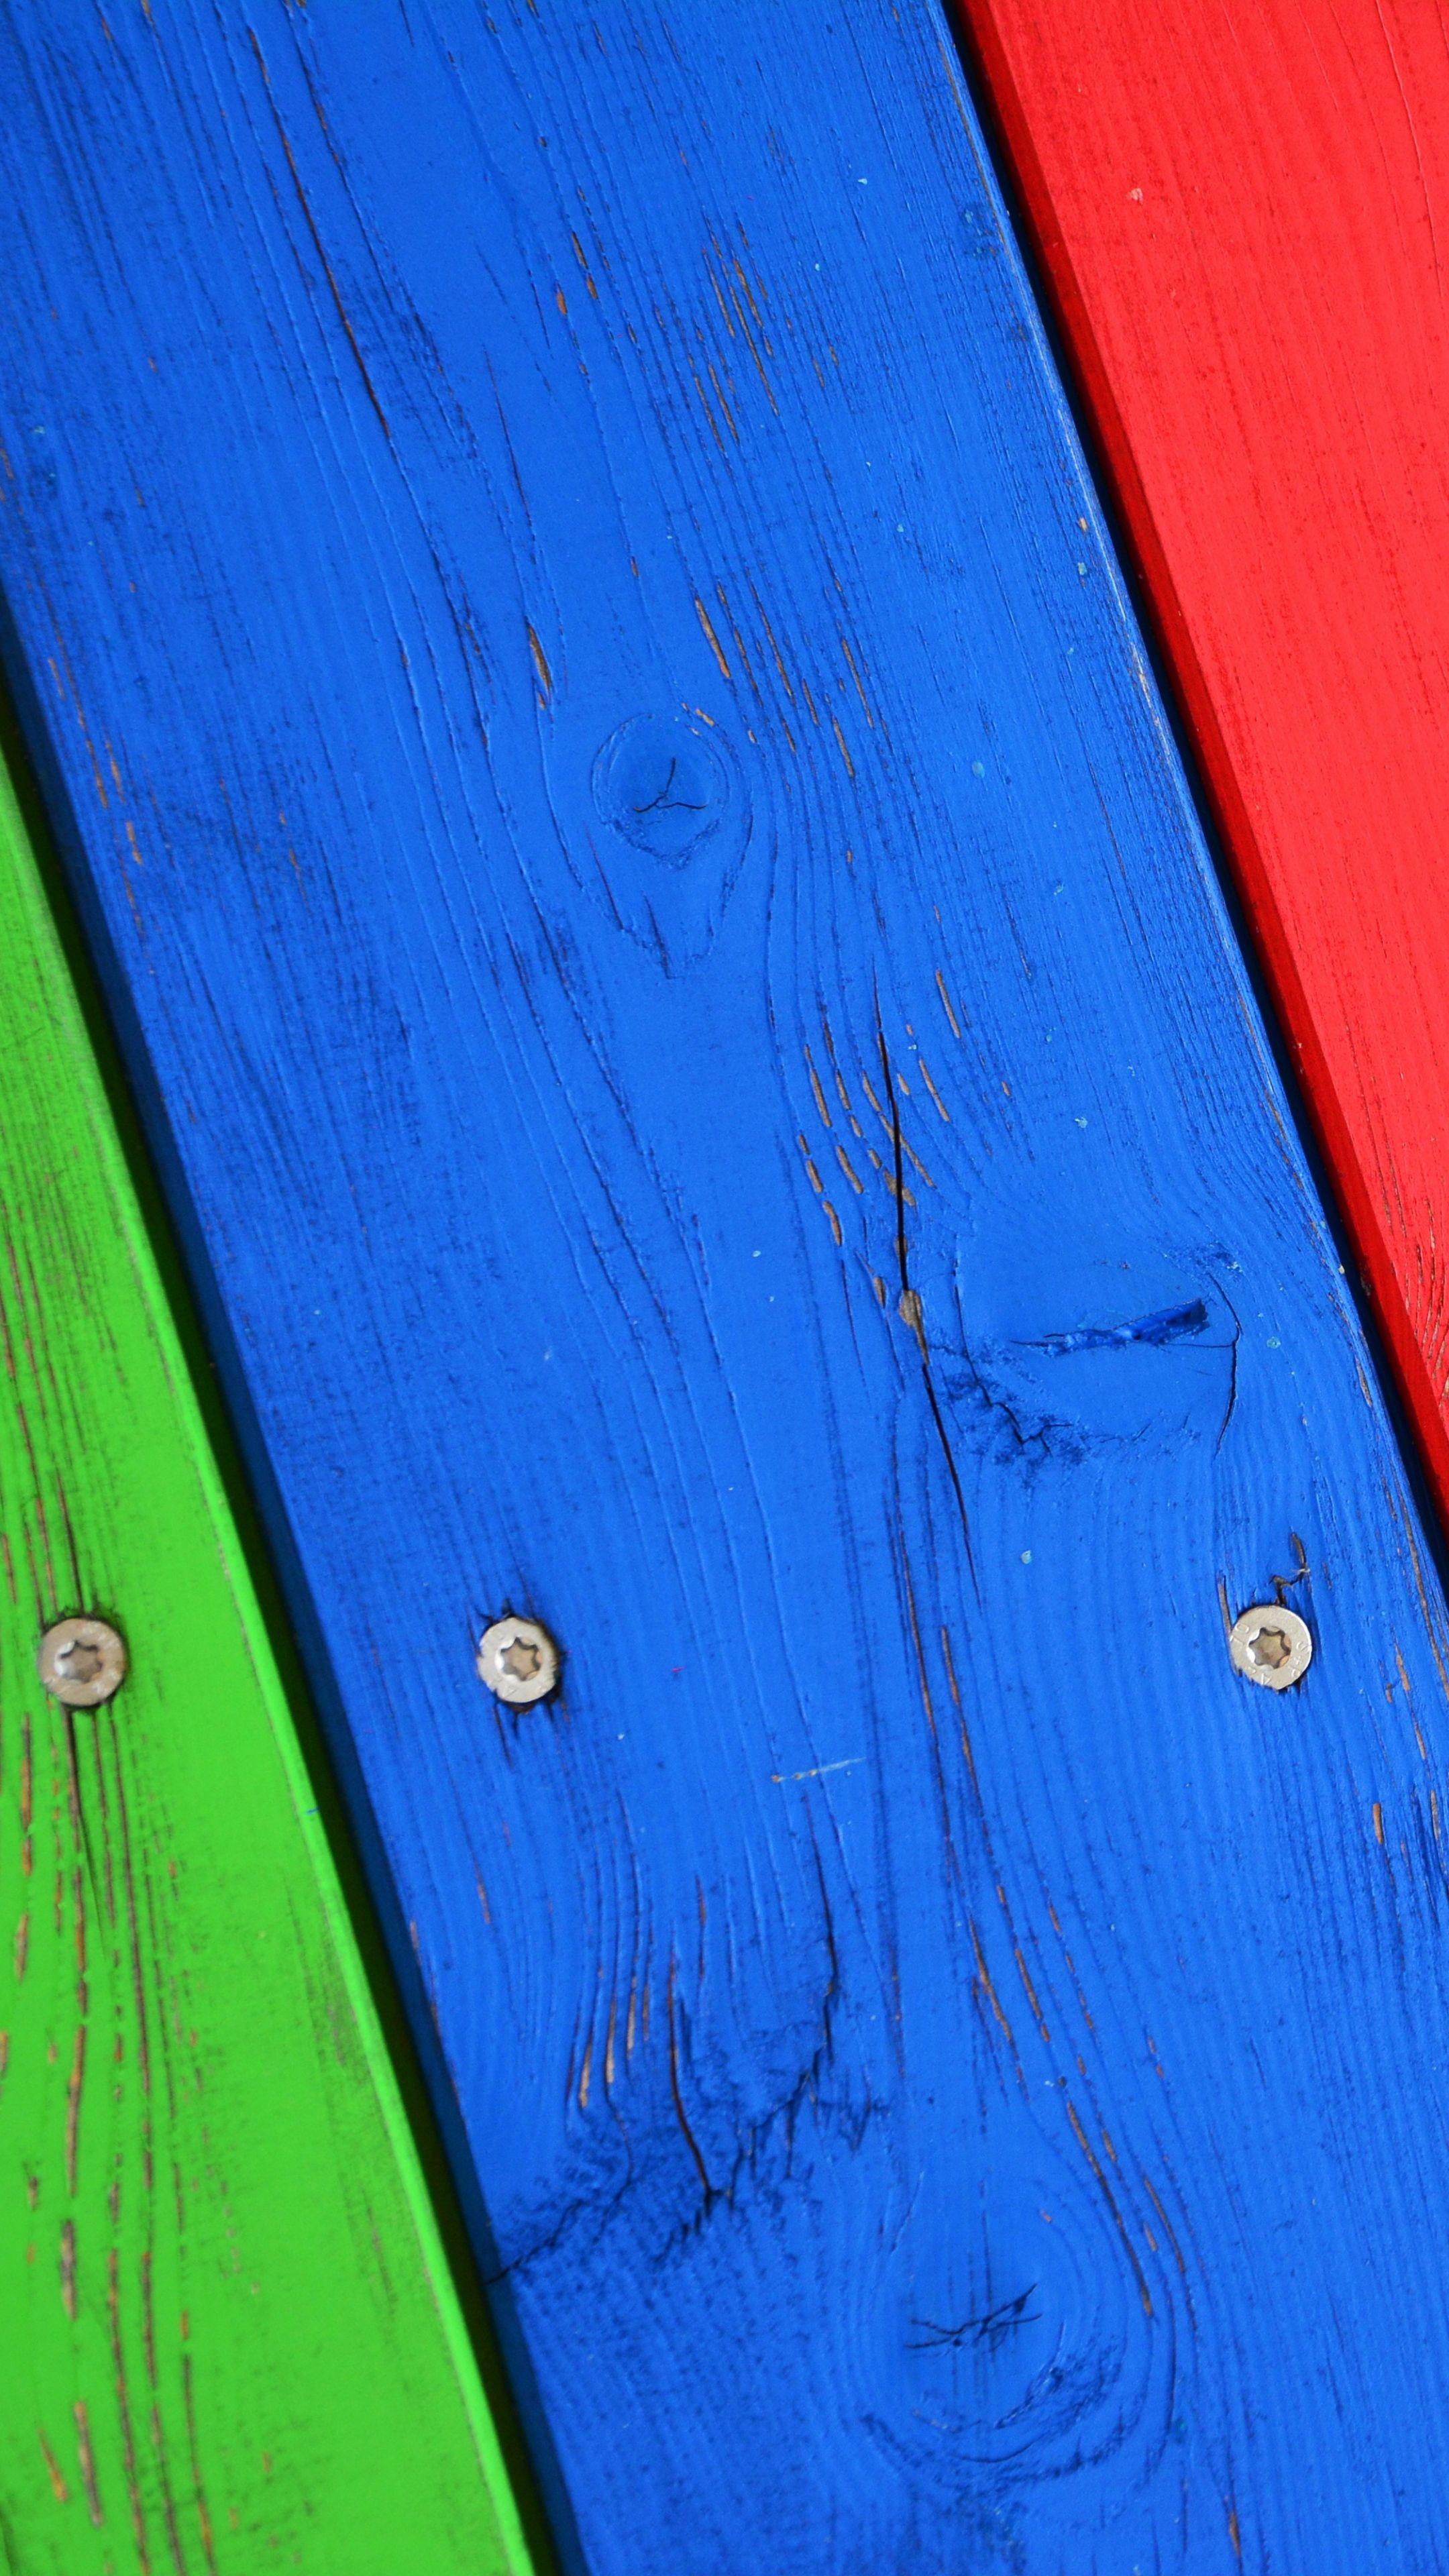 Download Wallpaper 2160x3840 Texture Wooden Board Bright 4k Sony Xperia Z5 Premium Dual Hd Background